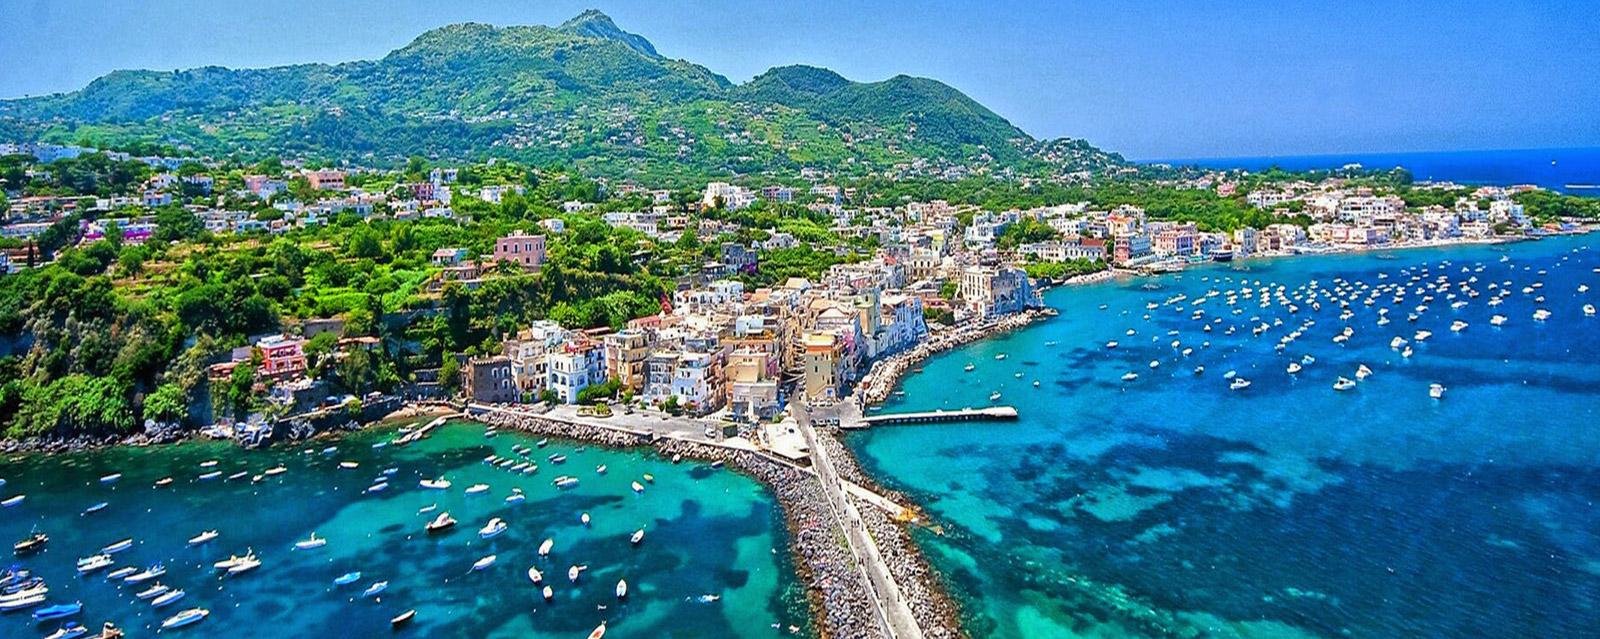 Offerte Ischia: Offerta Terme Ischia, Offerte Speciali Hotel Ischia